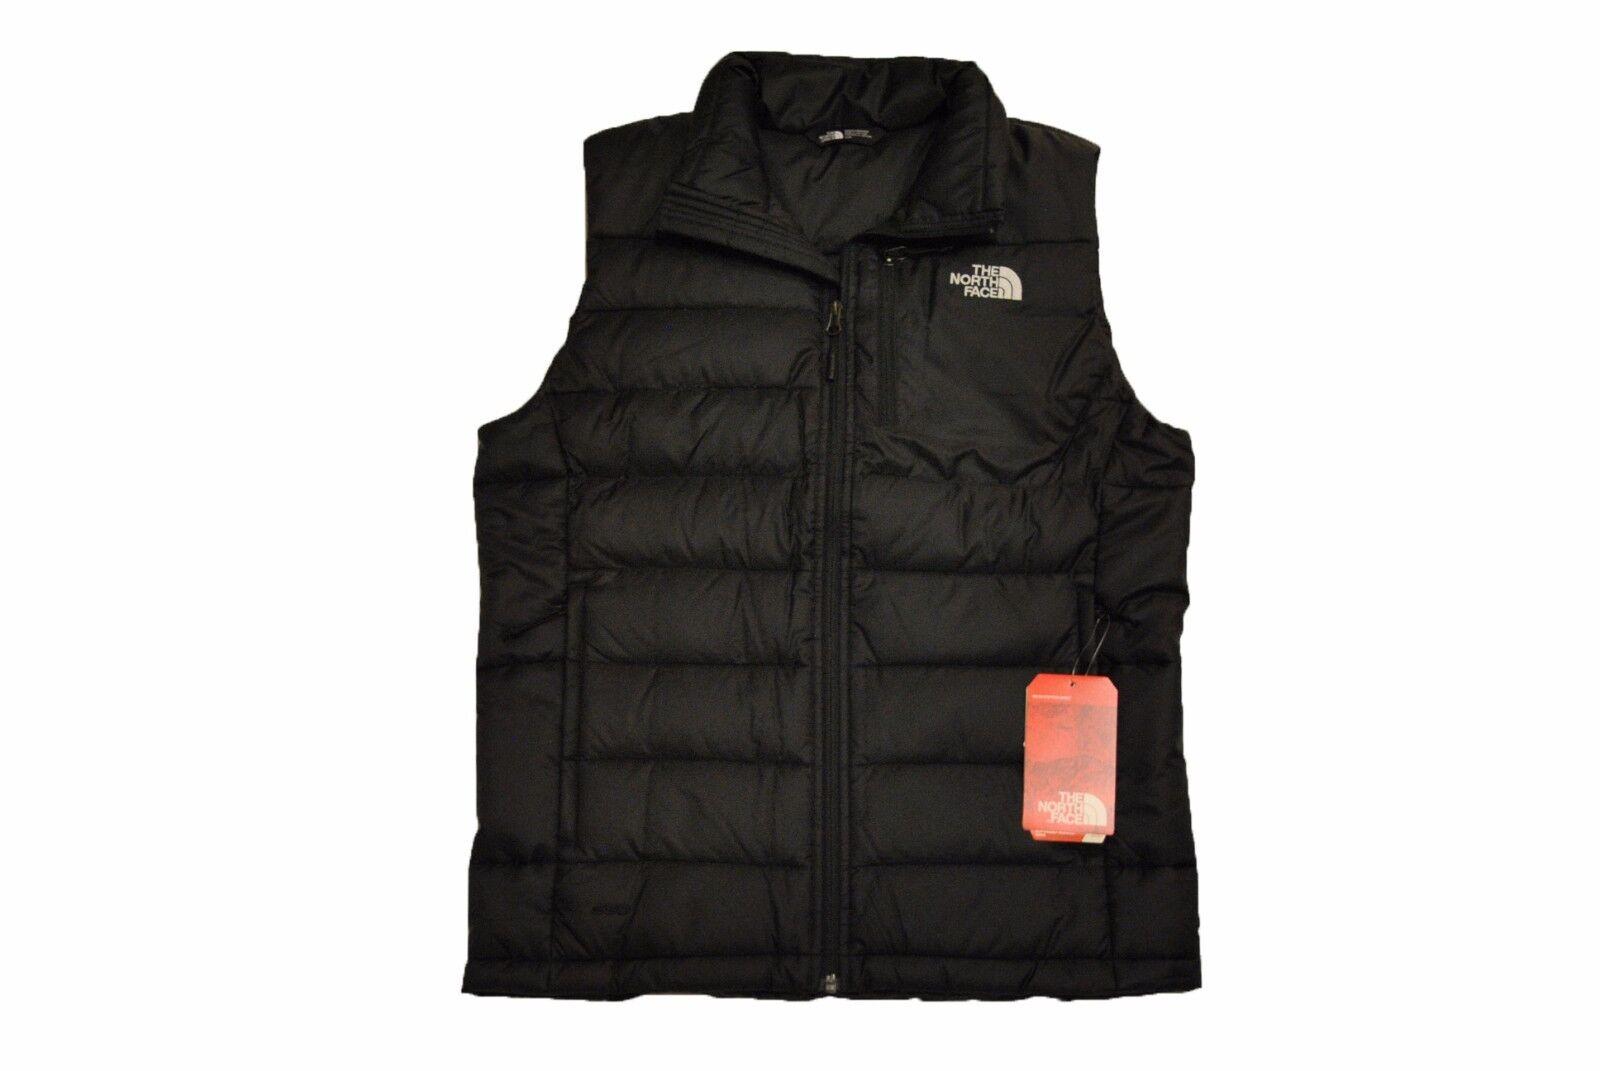 The North Face TNF Aconcagua Vest 男款羽绒背心